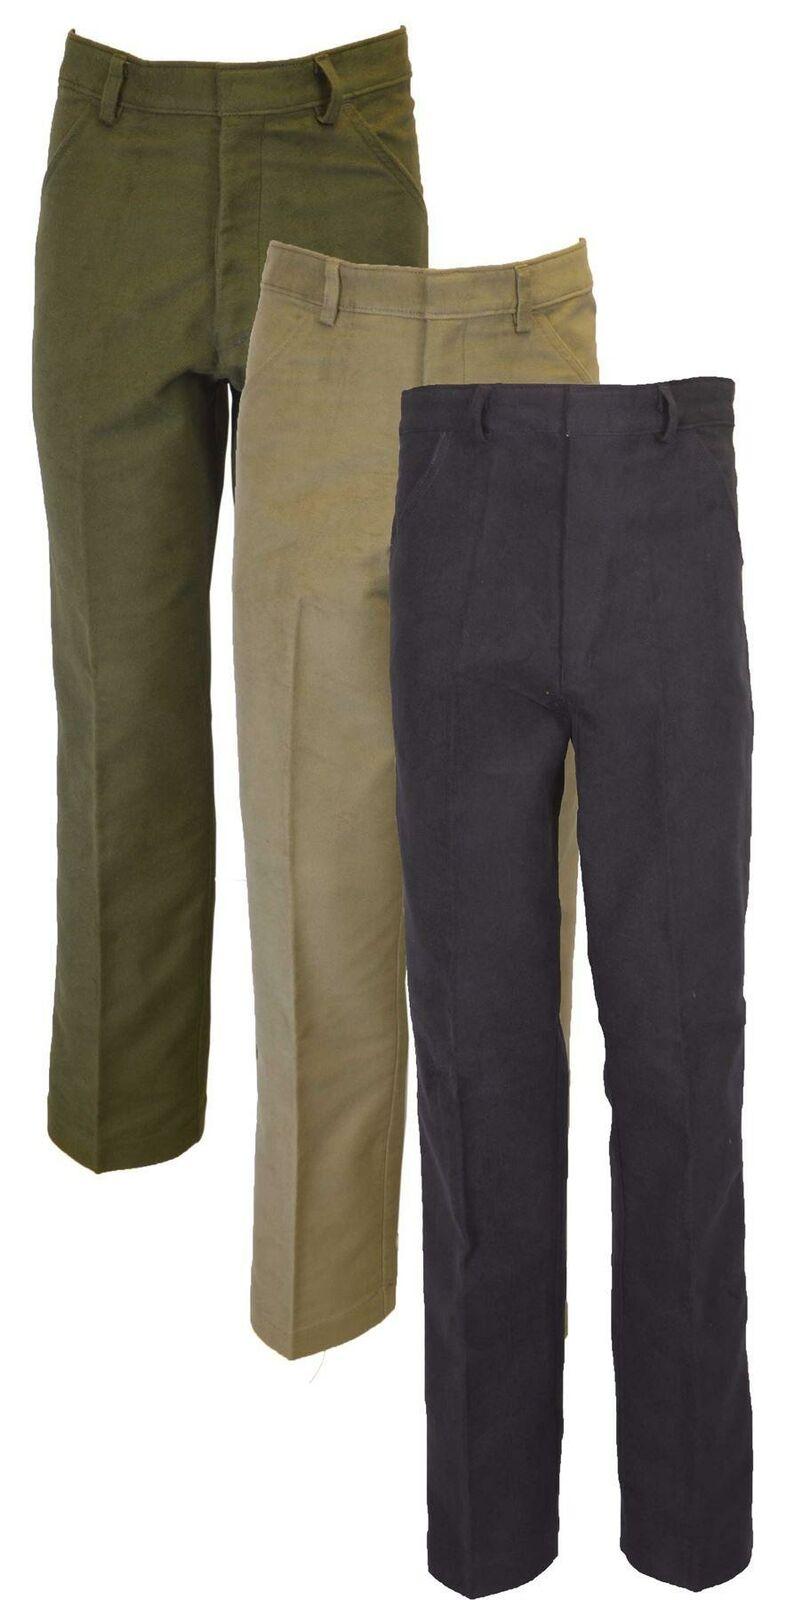 New Mens Moleskin Trousers Country Wear Carabou Hunting Fishing Walking Wine